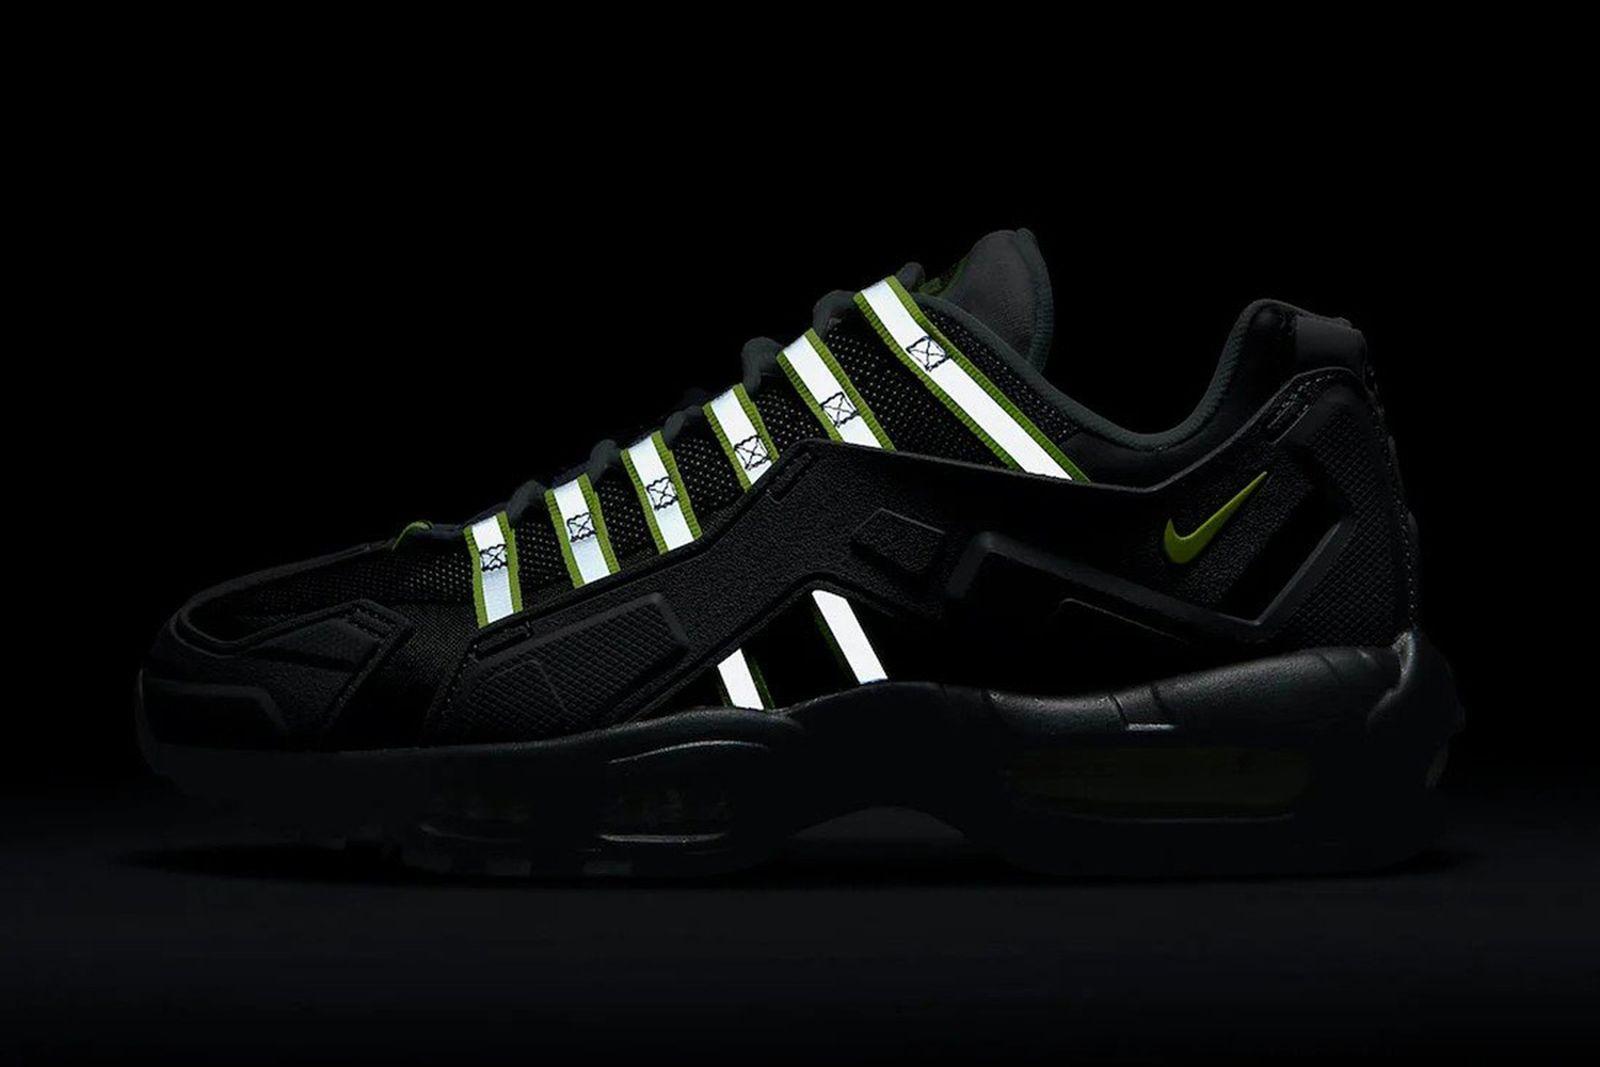 nike-air-max-95-ndstrkt-neon-release-date-price-03